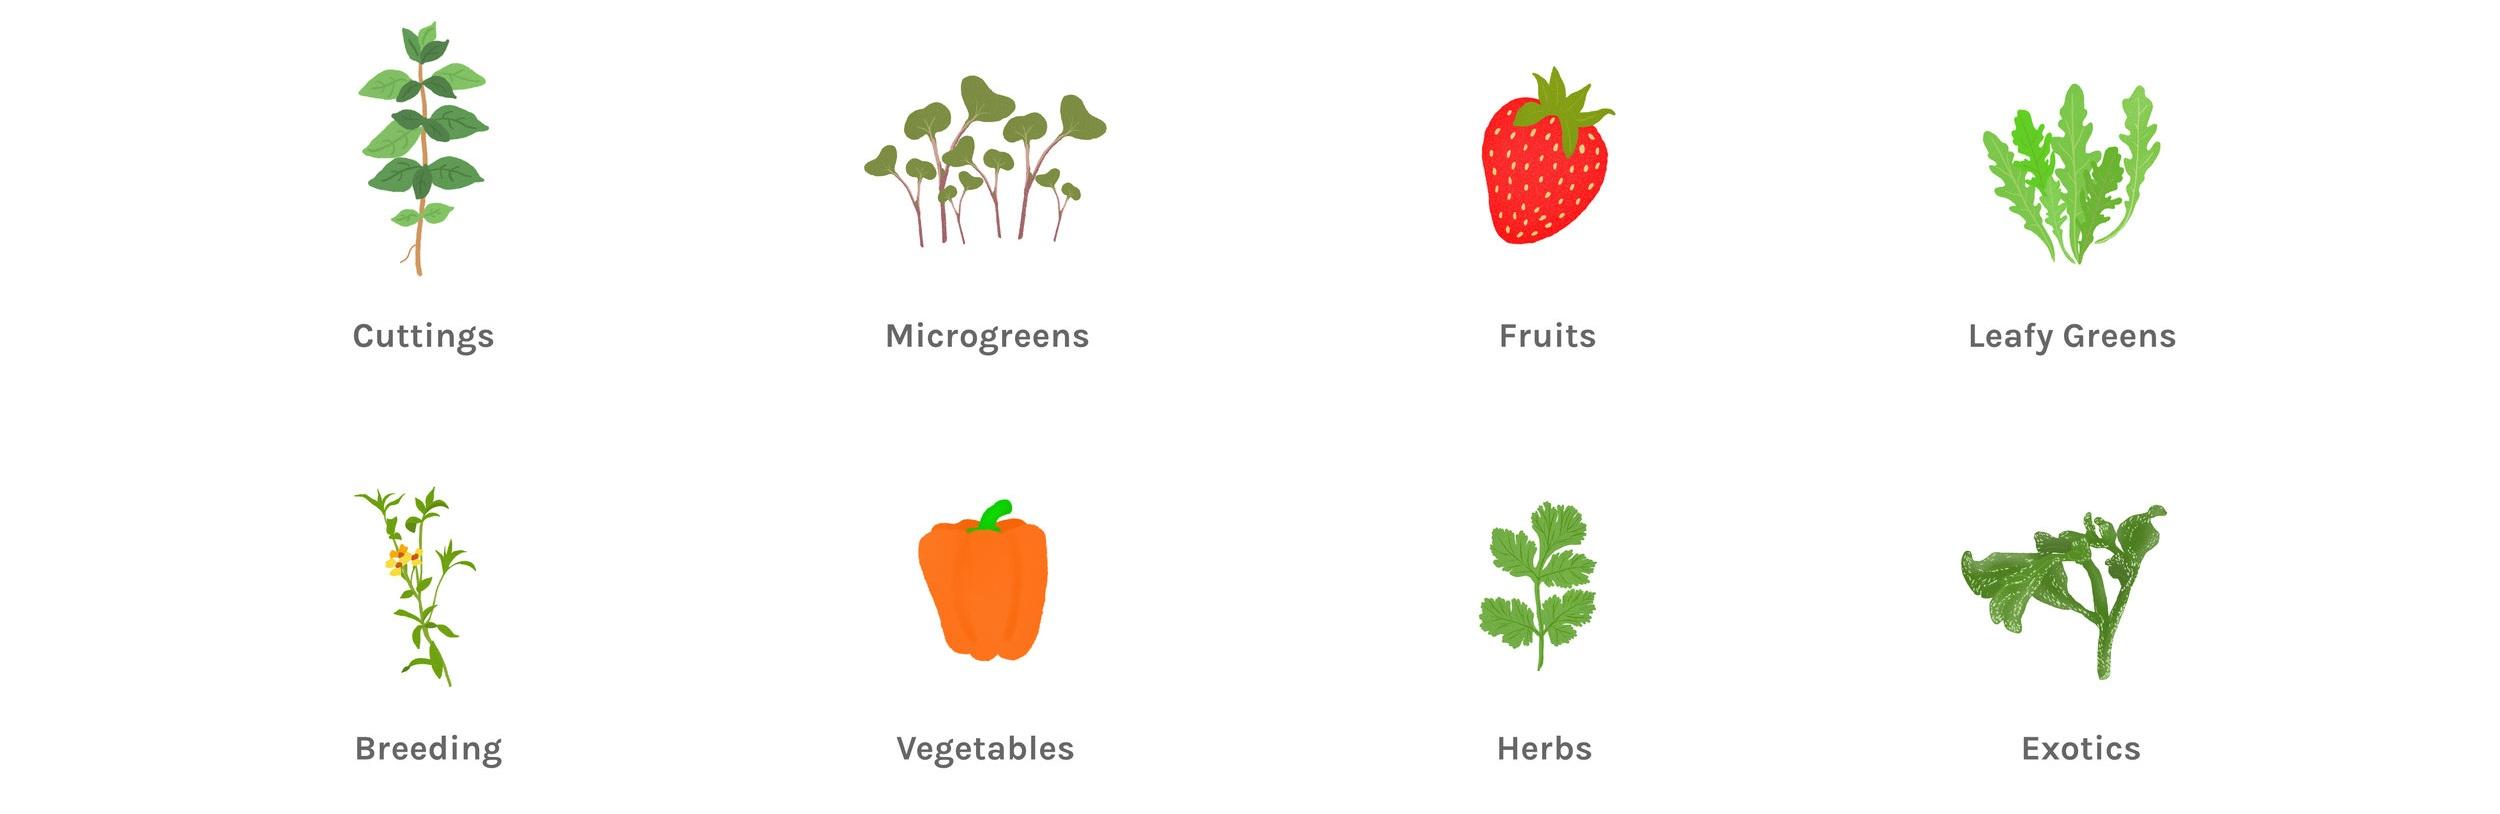 Plants+List+Graphic.jpg